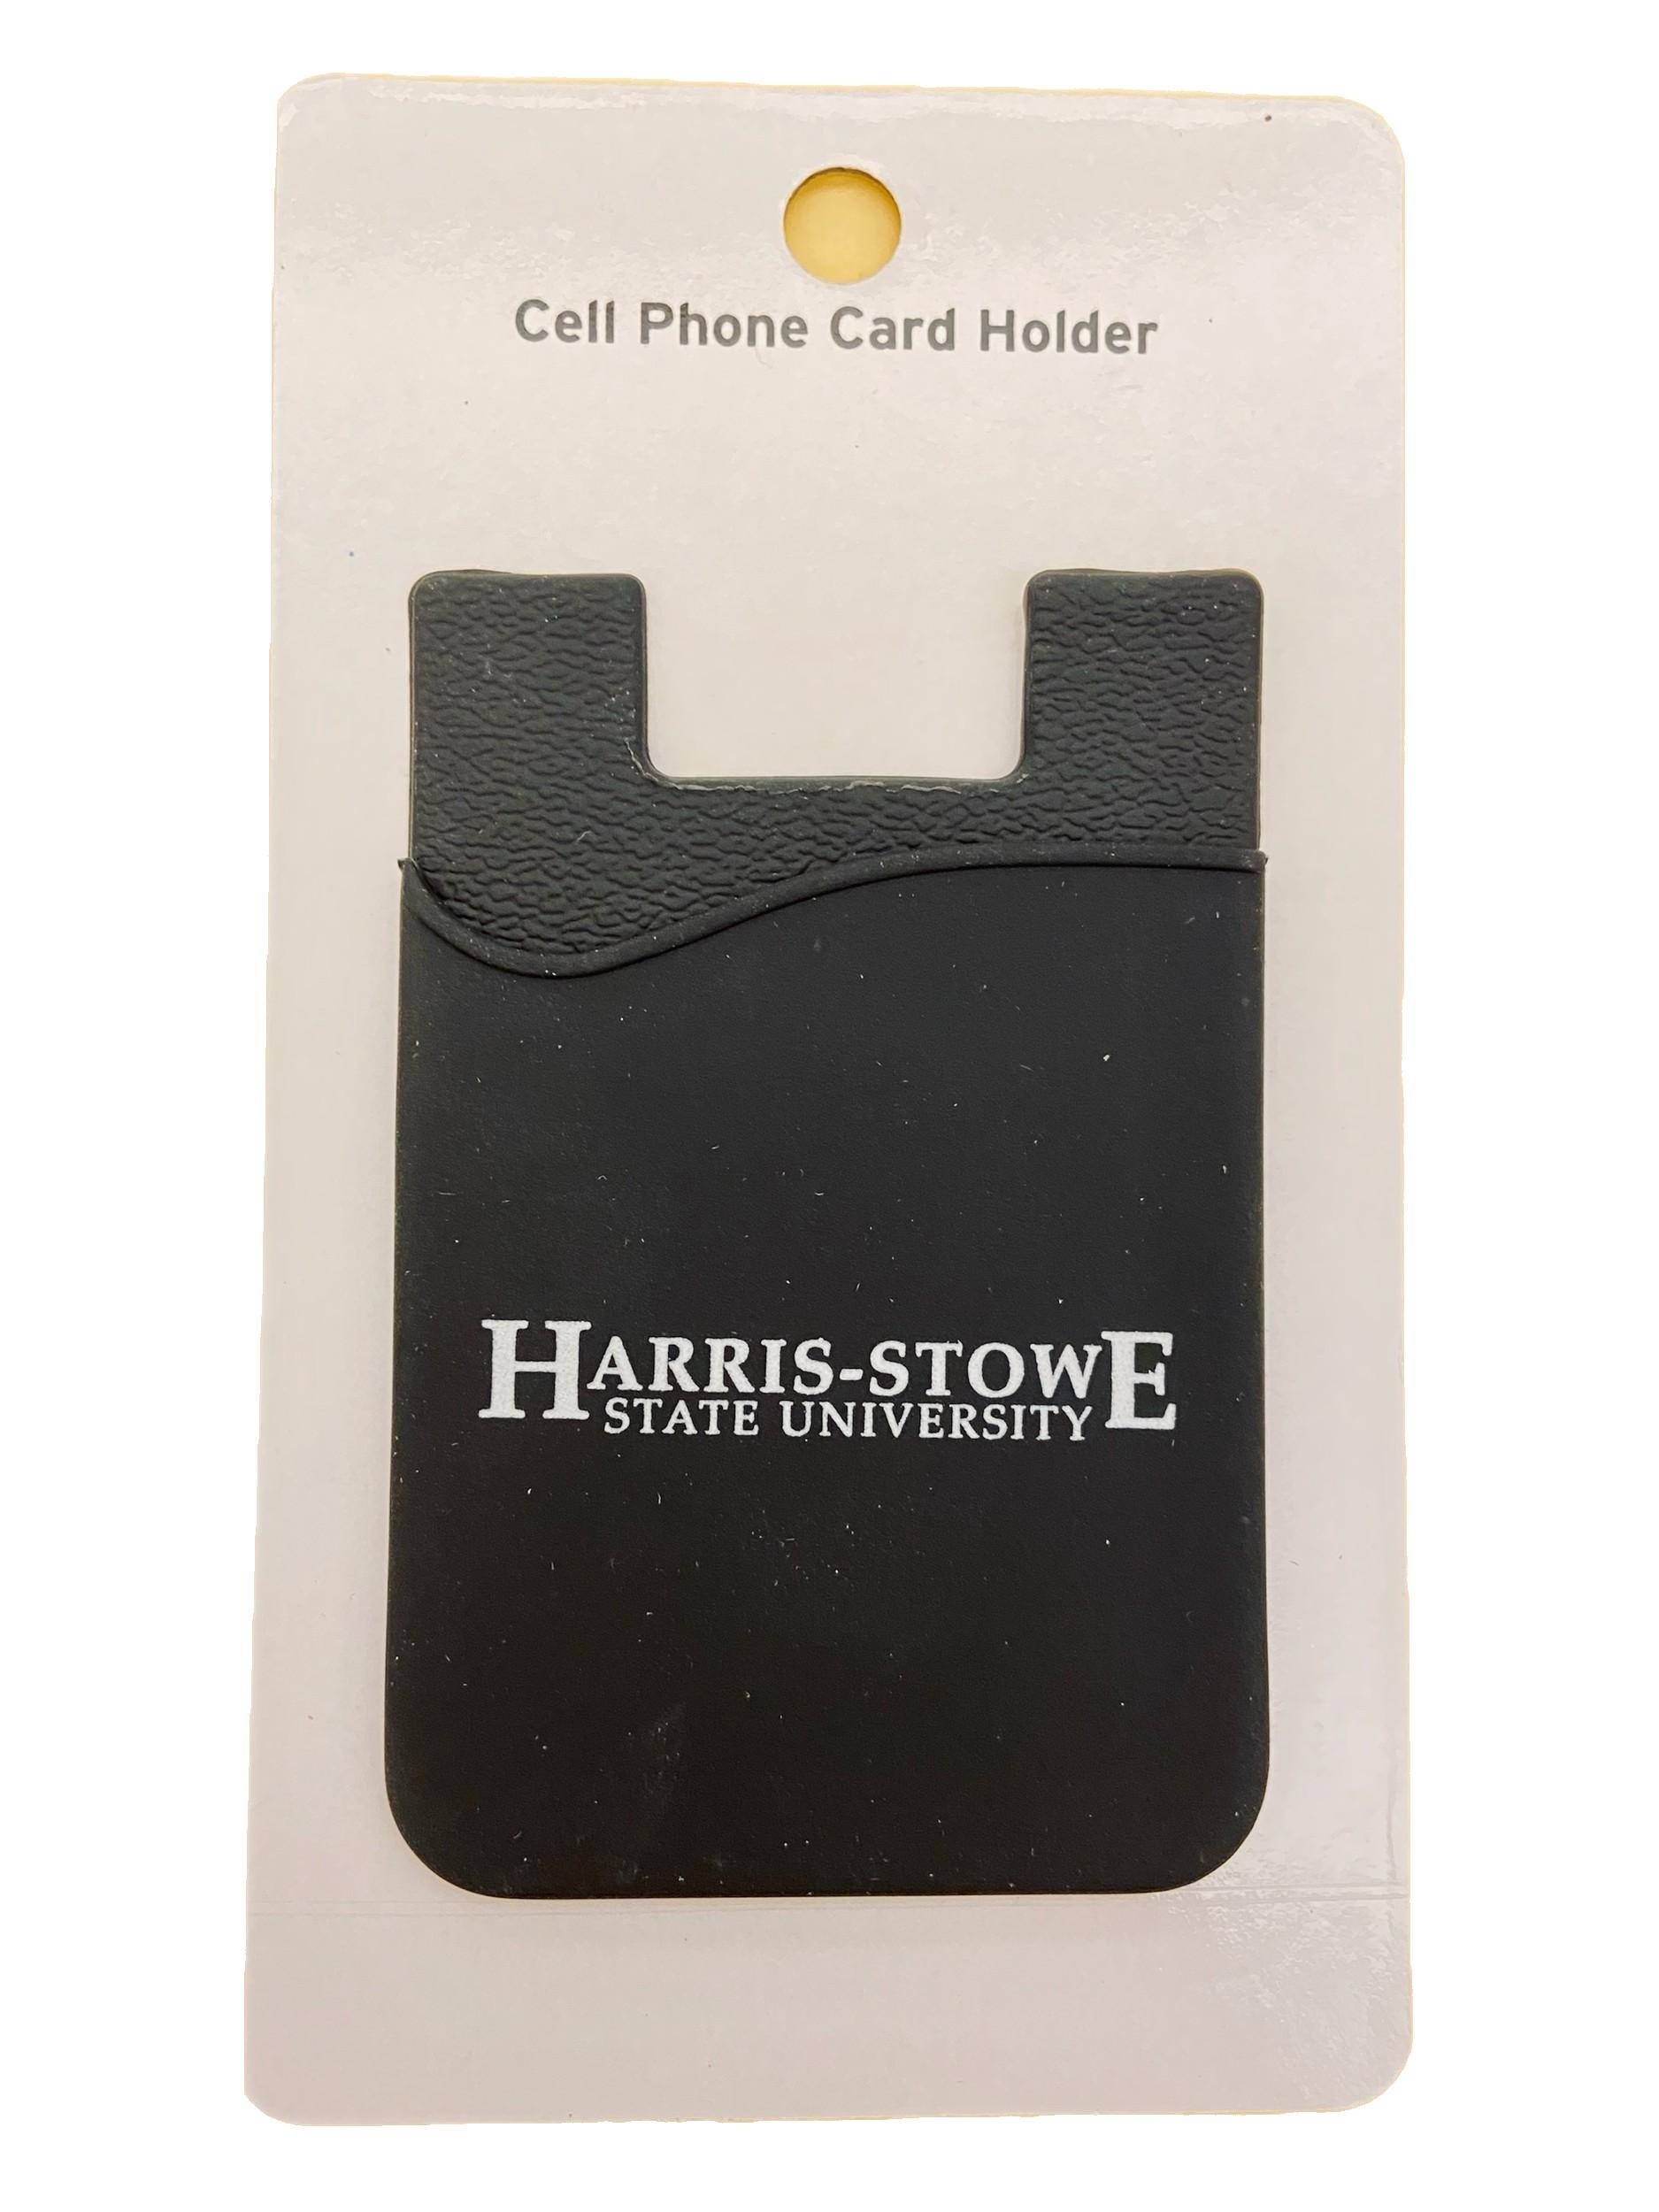 HSSU Cell Phone Card Holder